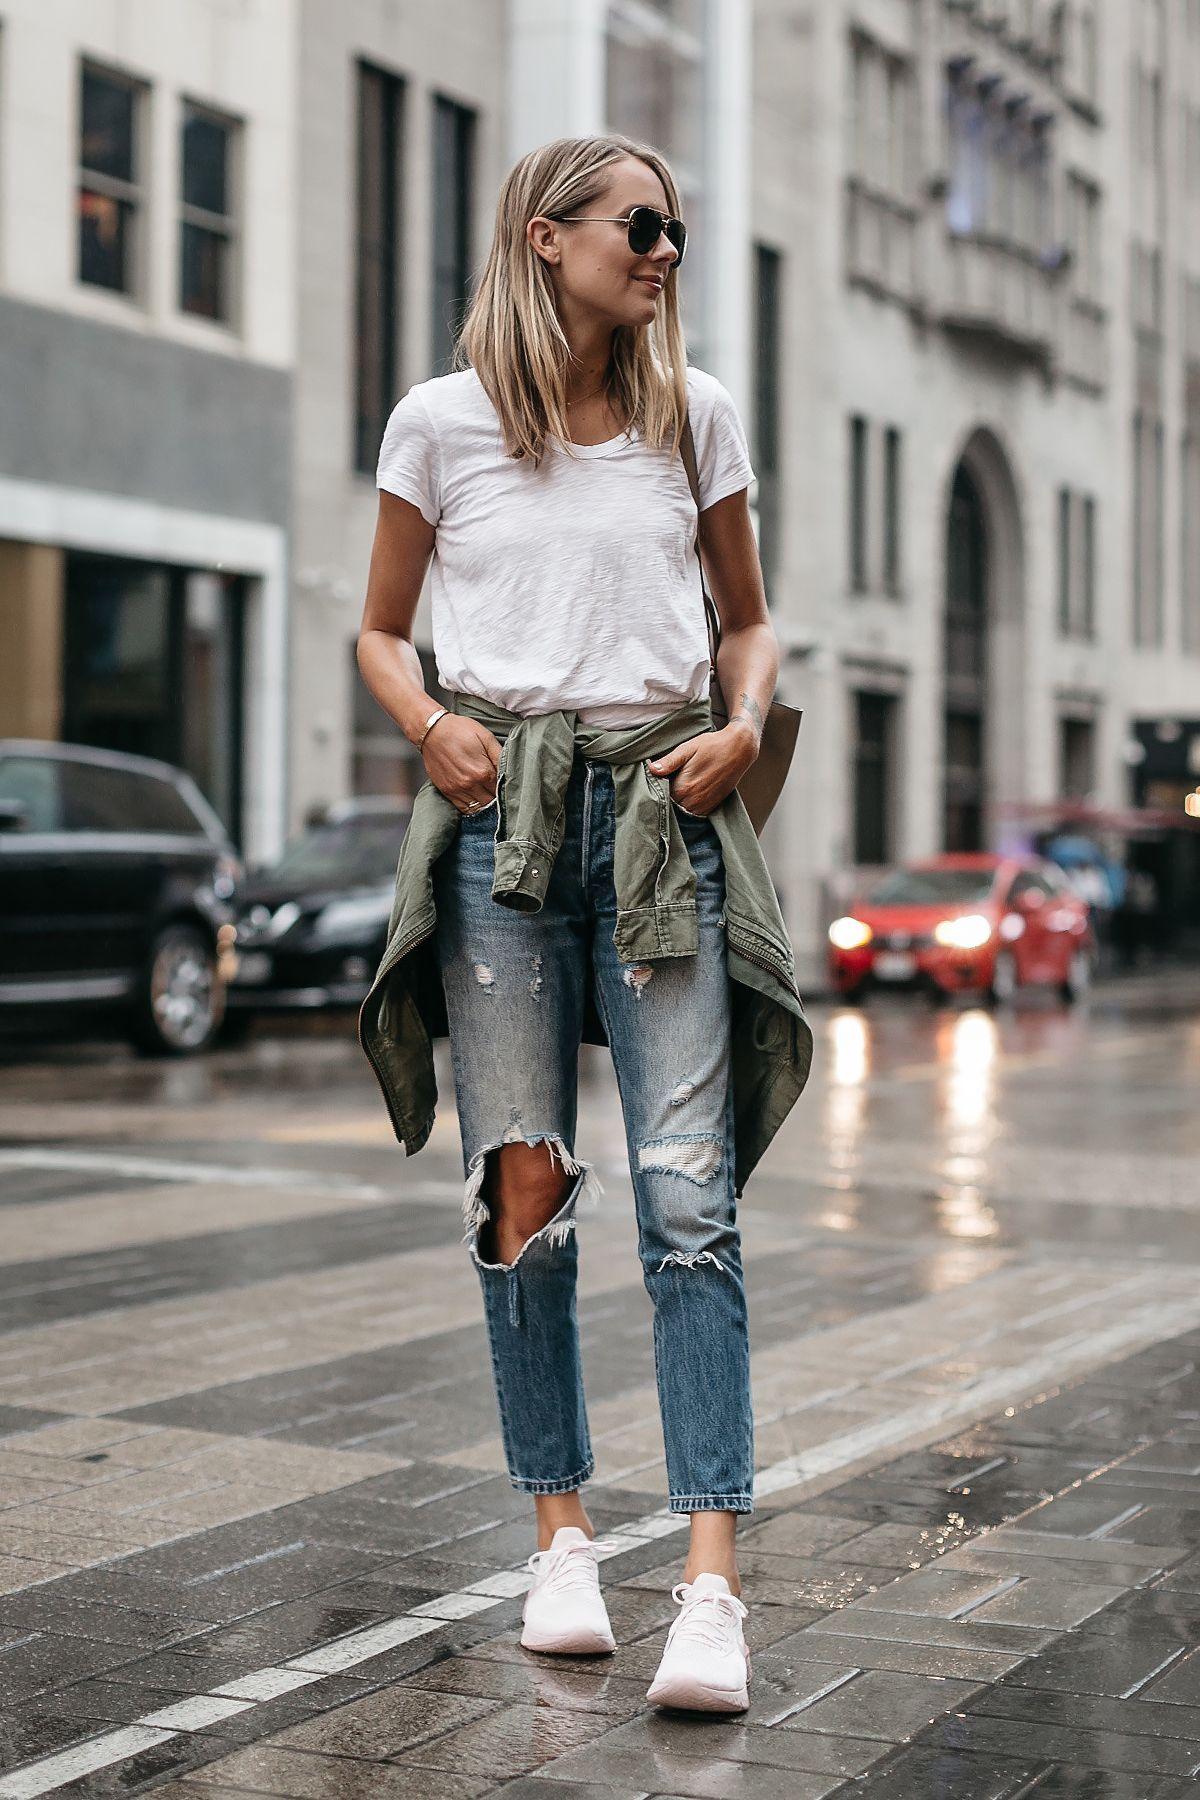 890763e97e9 Blonde Woman Wearing Nike React Running Shoe White Tshirt Ripped Denim Jeans  Green Utility Jacket Fashion Jackson Dallas Blogger Fashion Blogger Street  ...